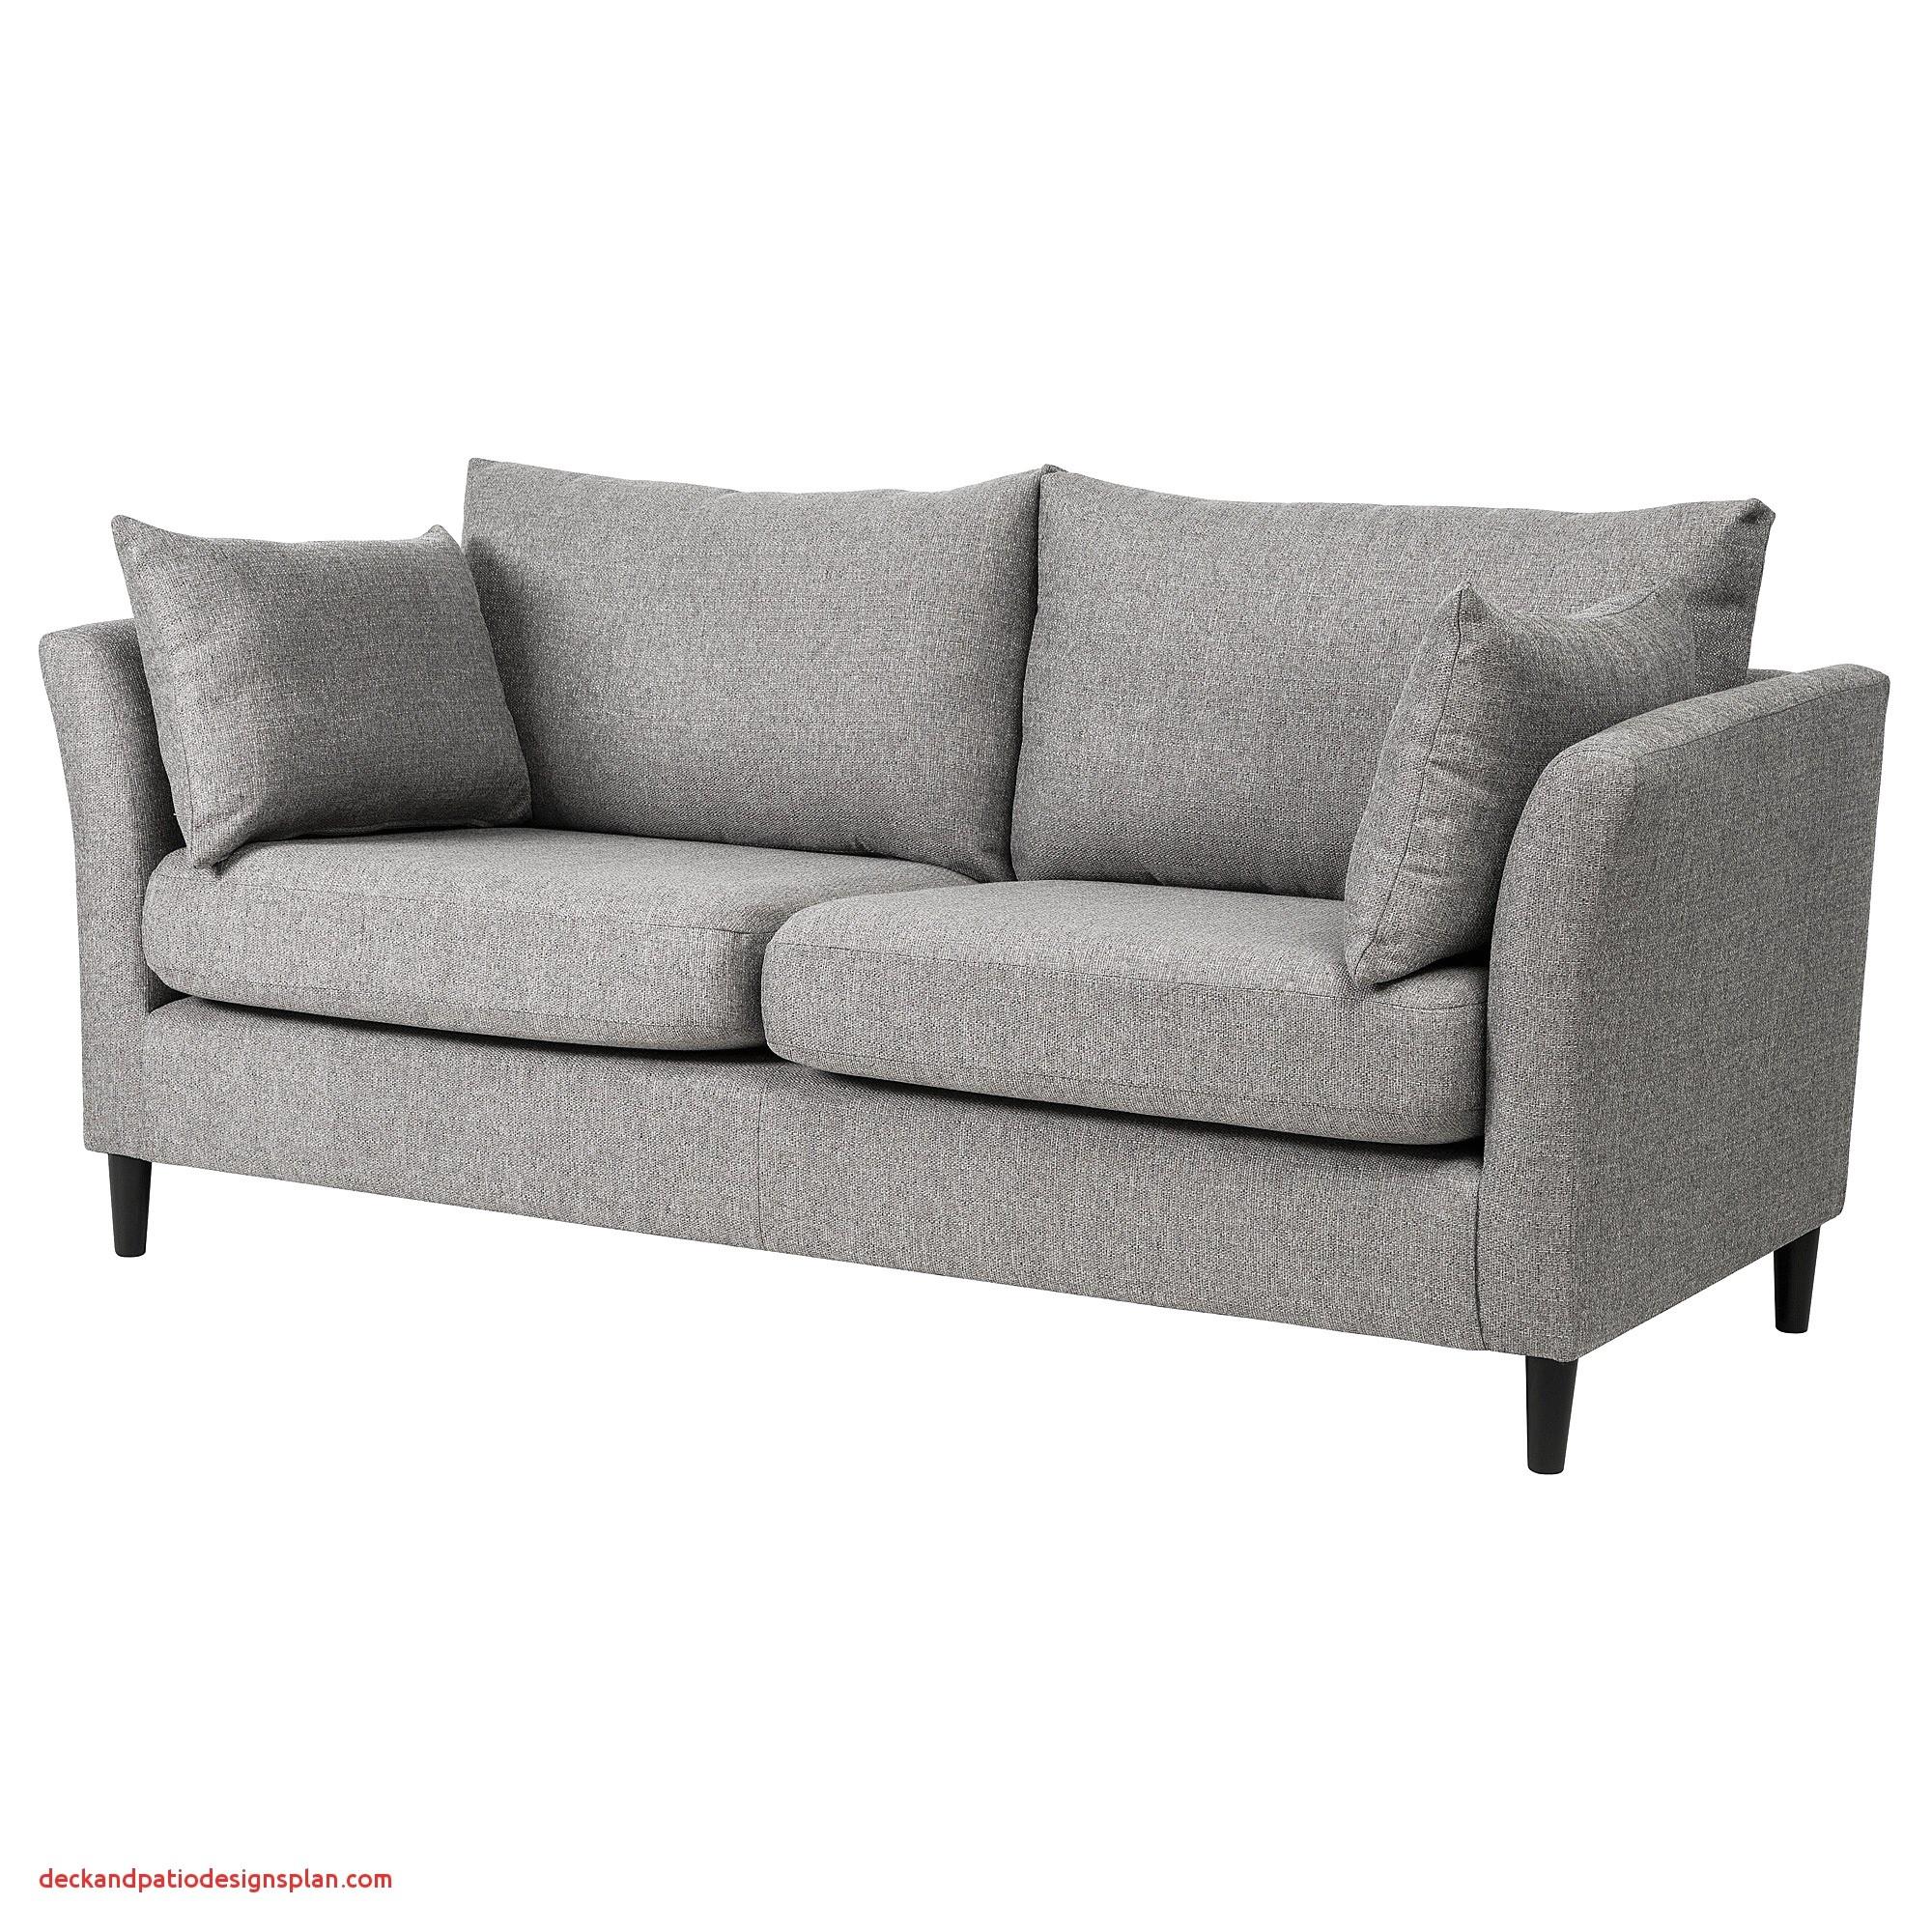 sofas bei ikea neu ikea stockholm lampe sofa bed ikea usa lovely wicker outdoor sofa 0d